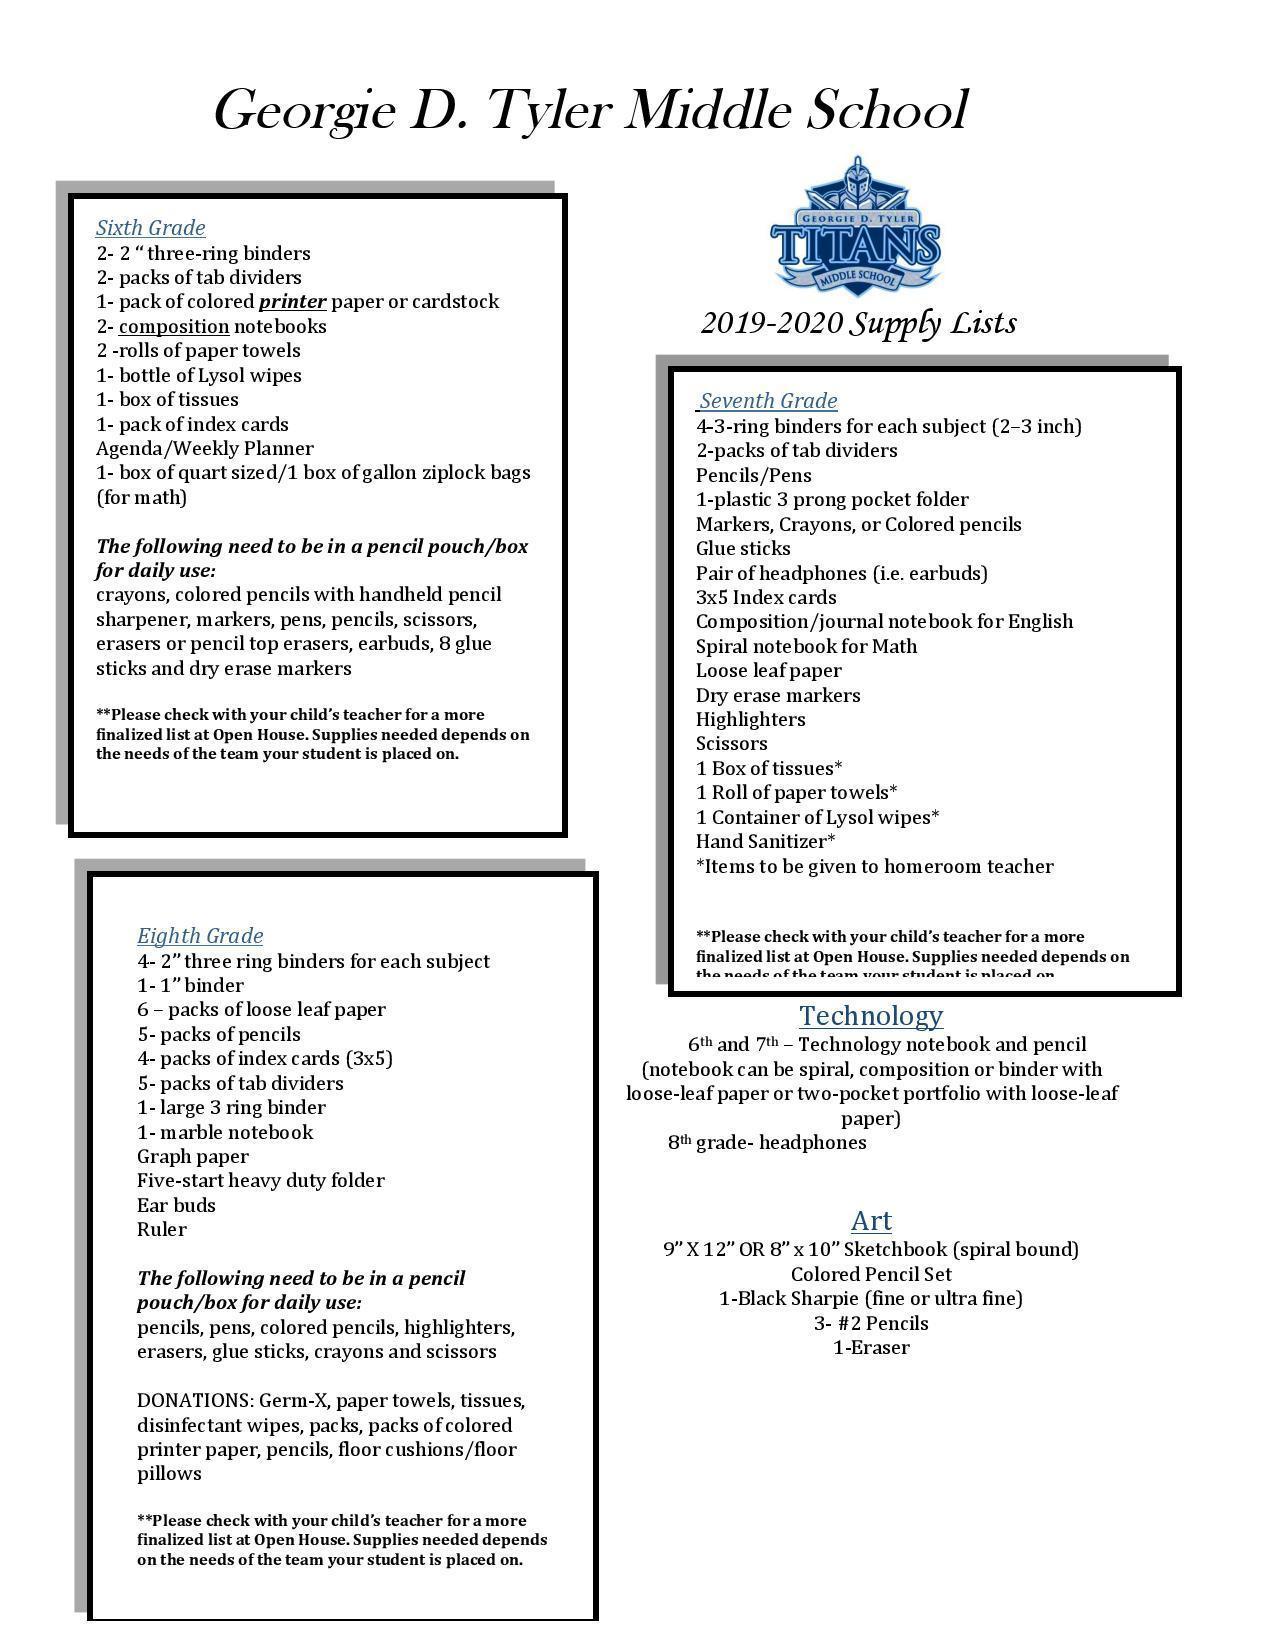 Us School Supply >> School Supply List Parents Georgie Tyler Middle School